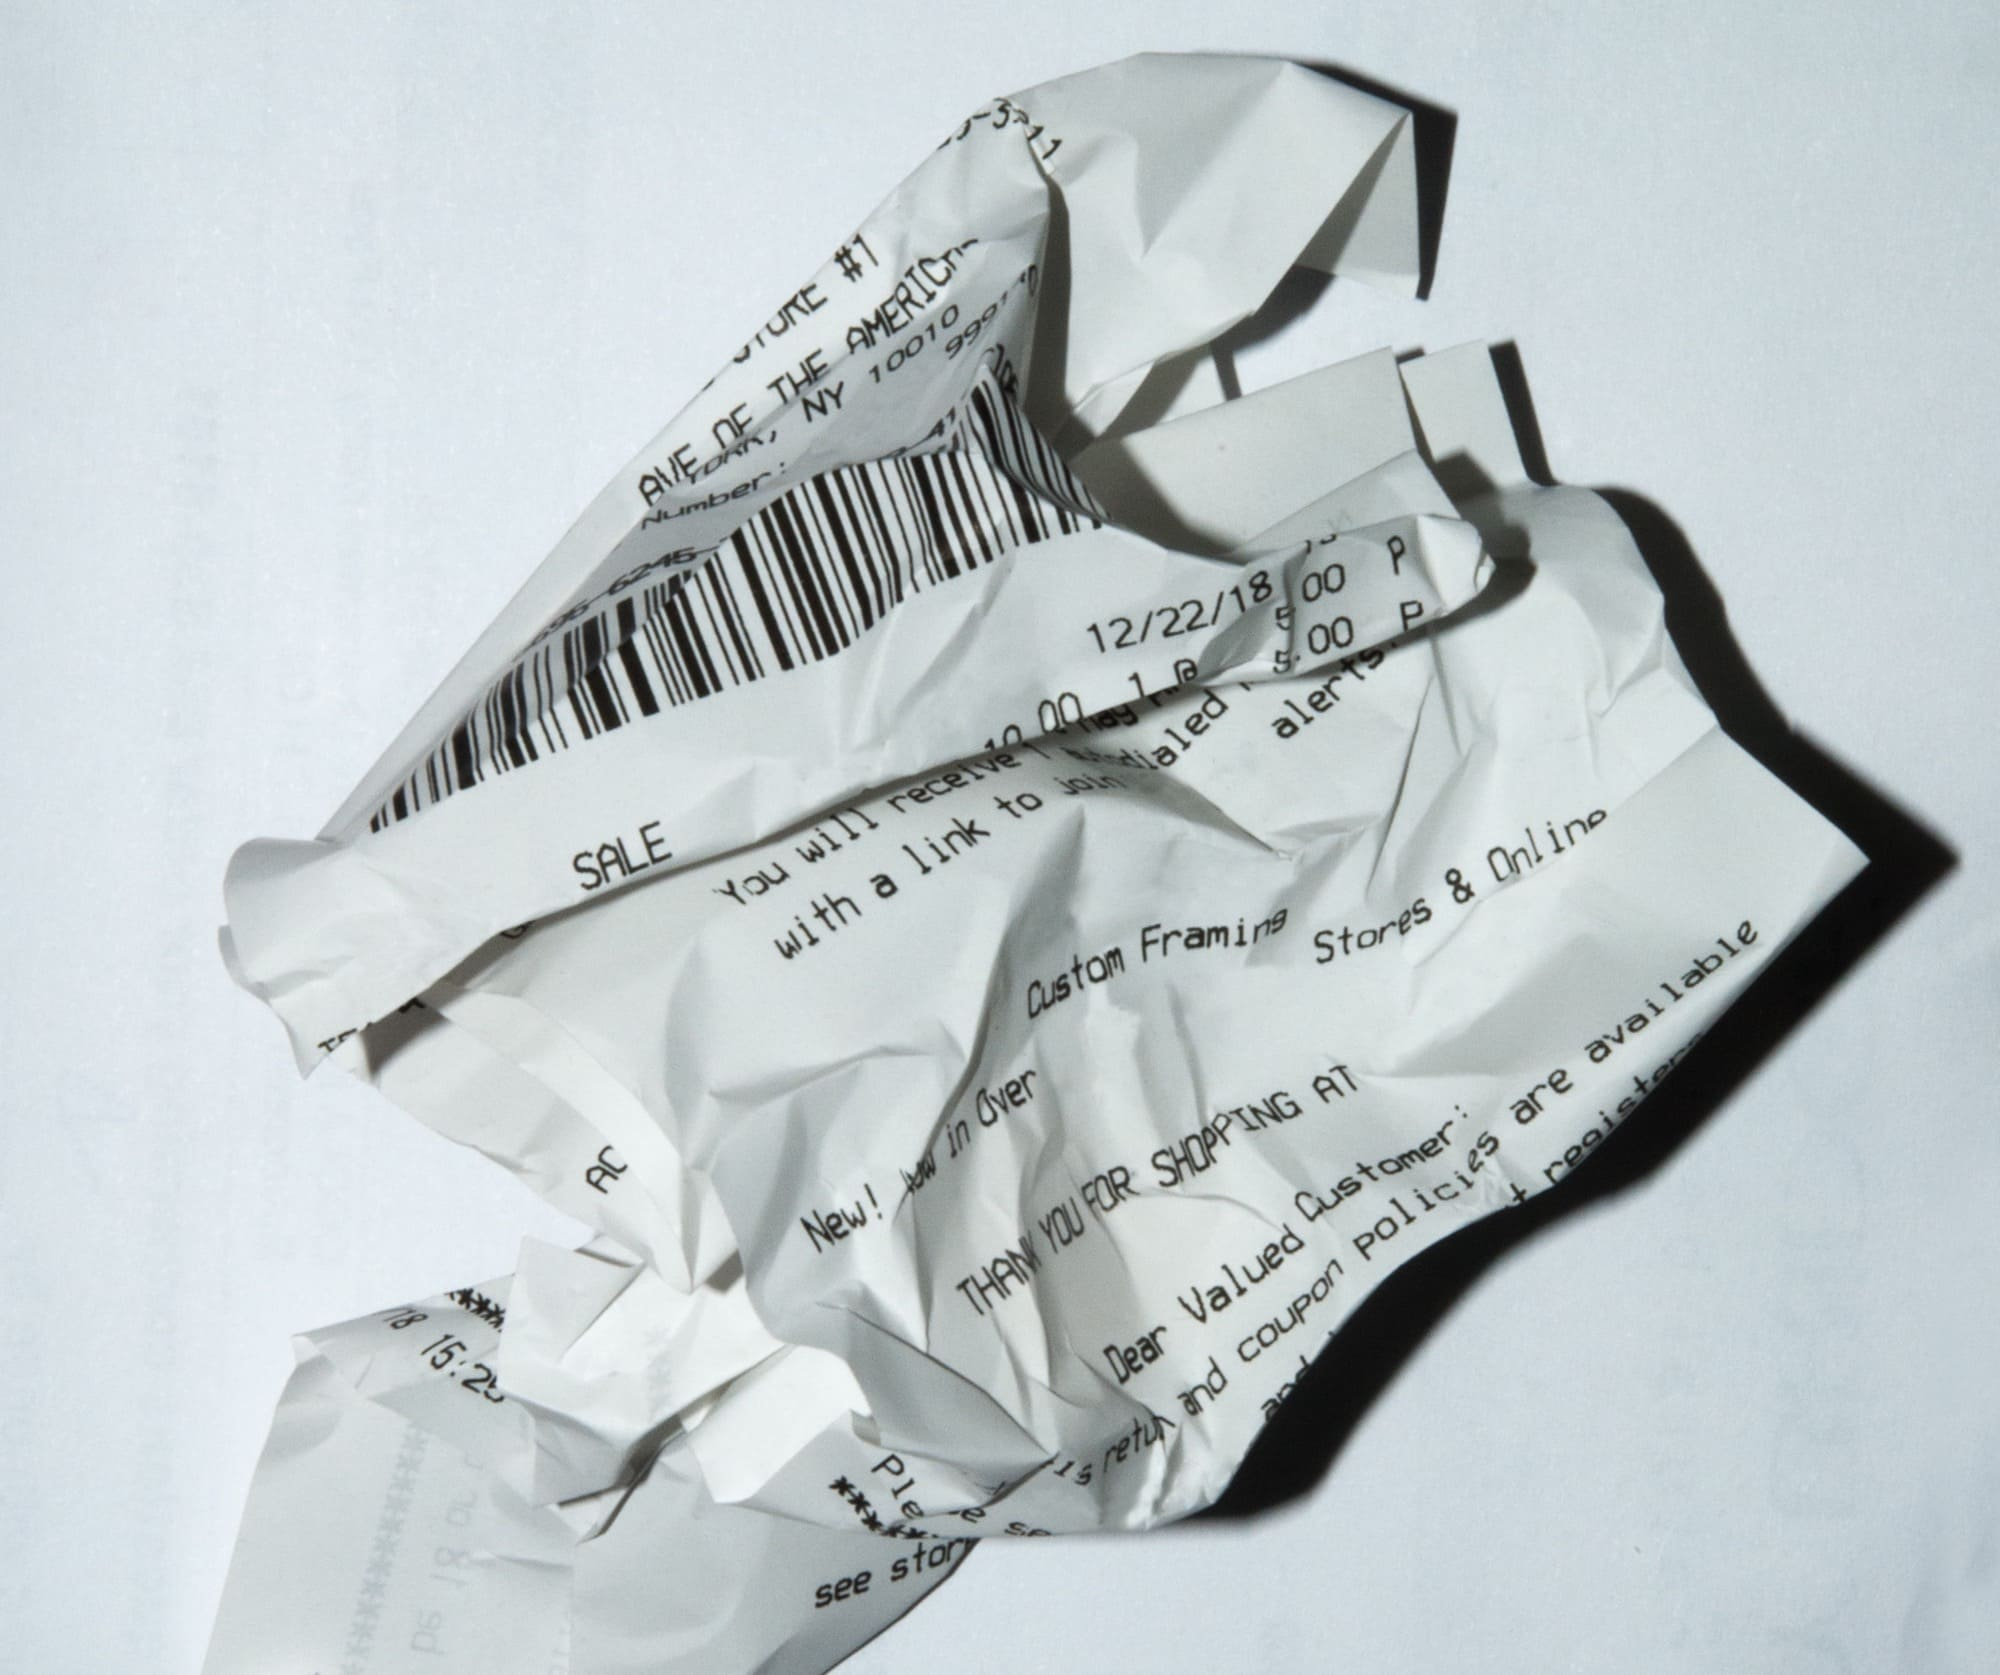 a crumpled up paper receipt